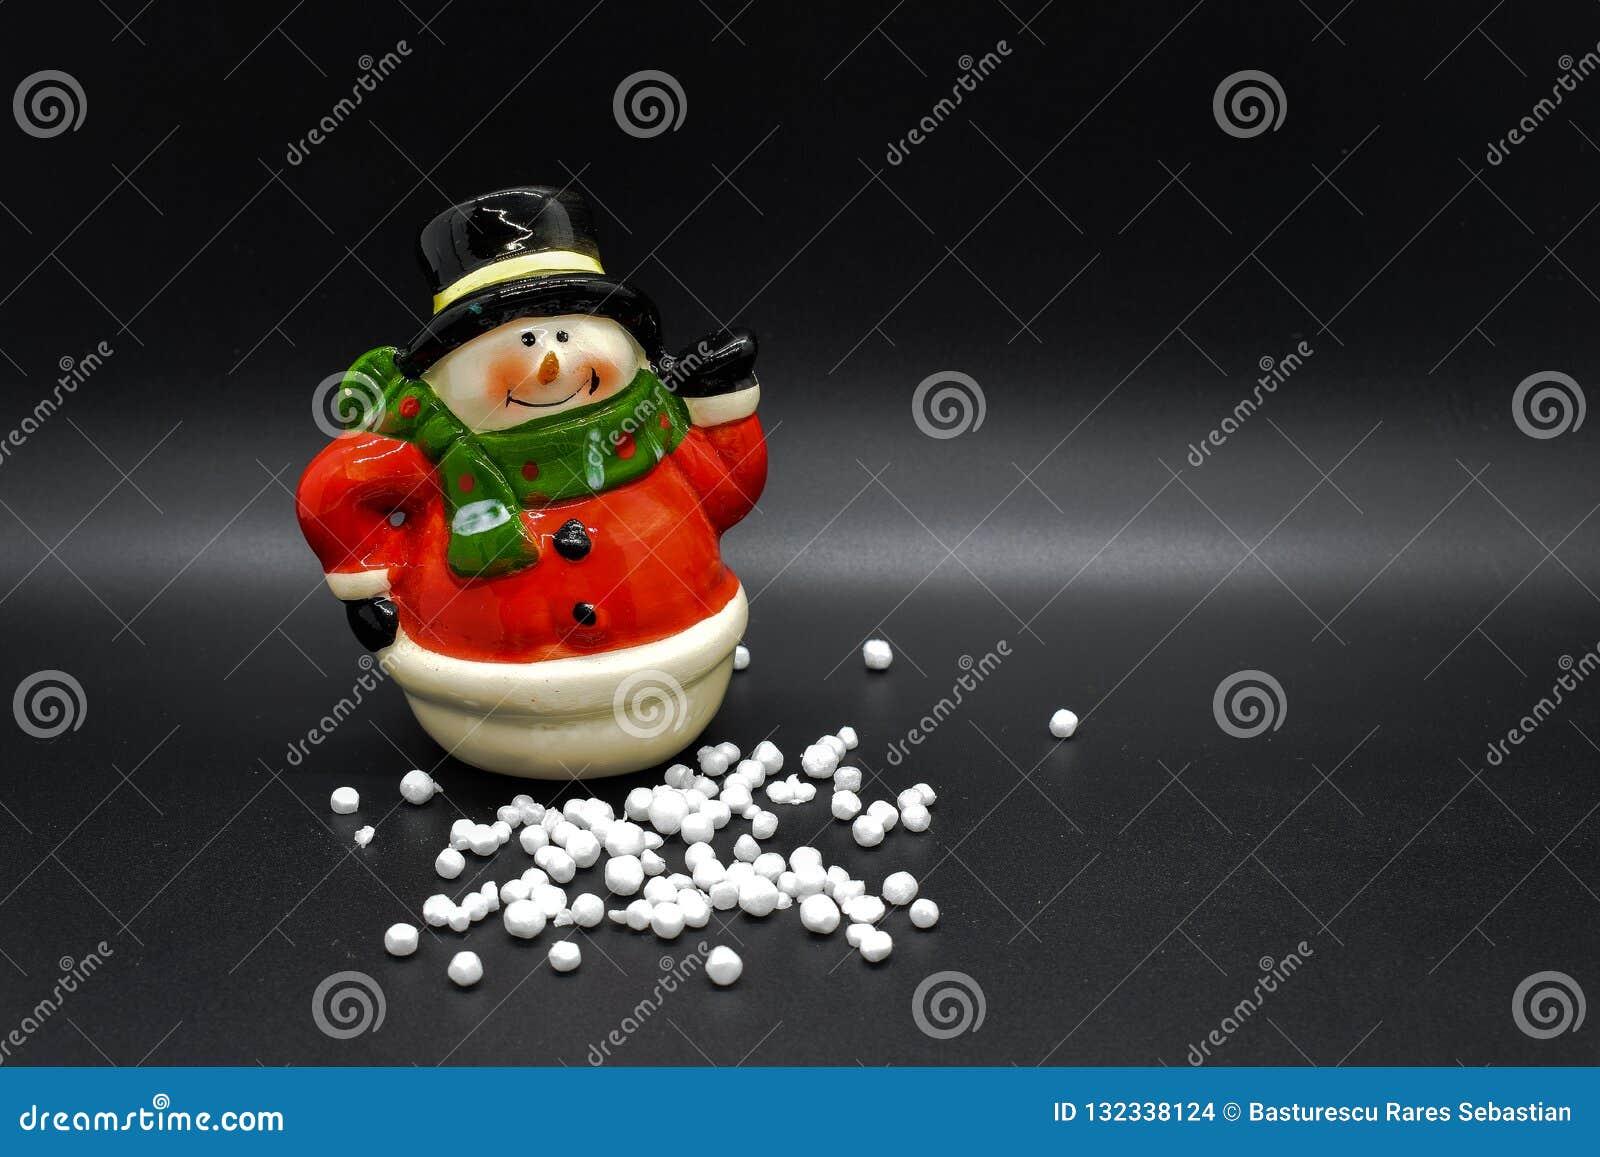 Handmade snowman figurine isolated on black background. Christmas decoration.